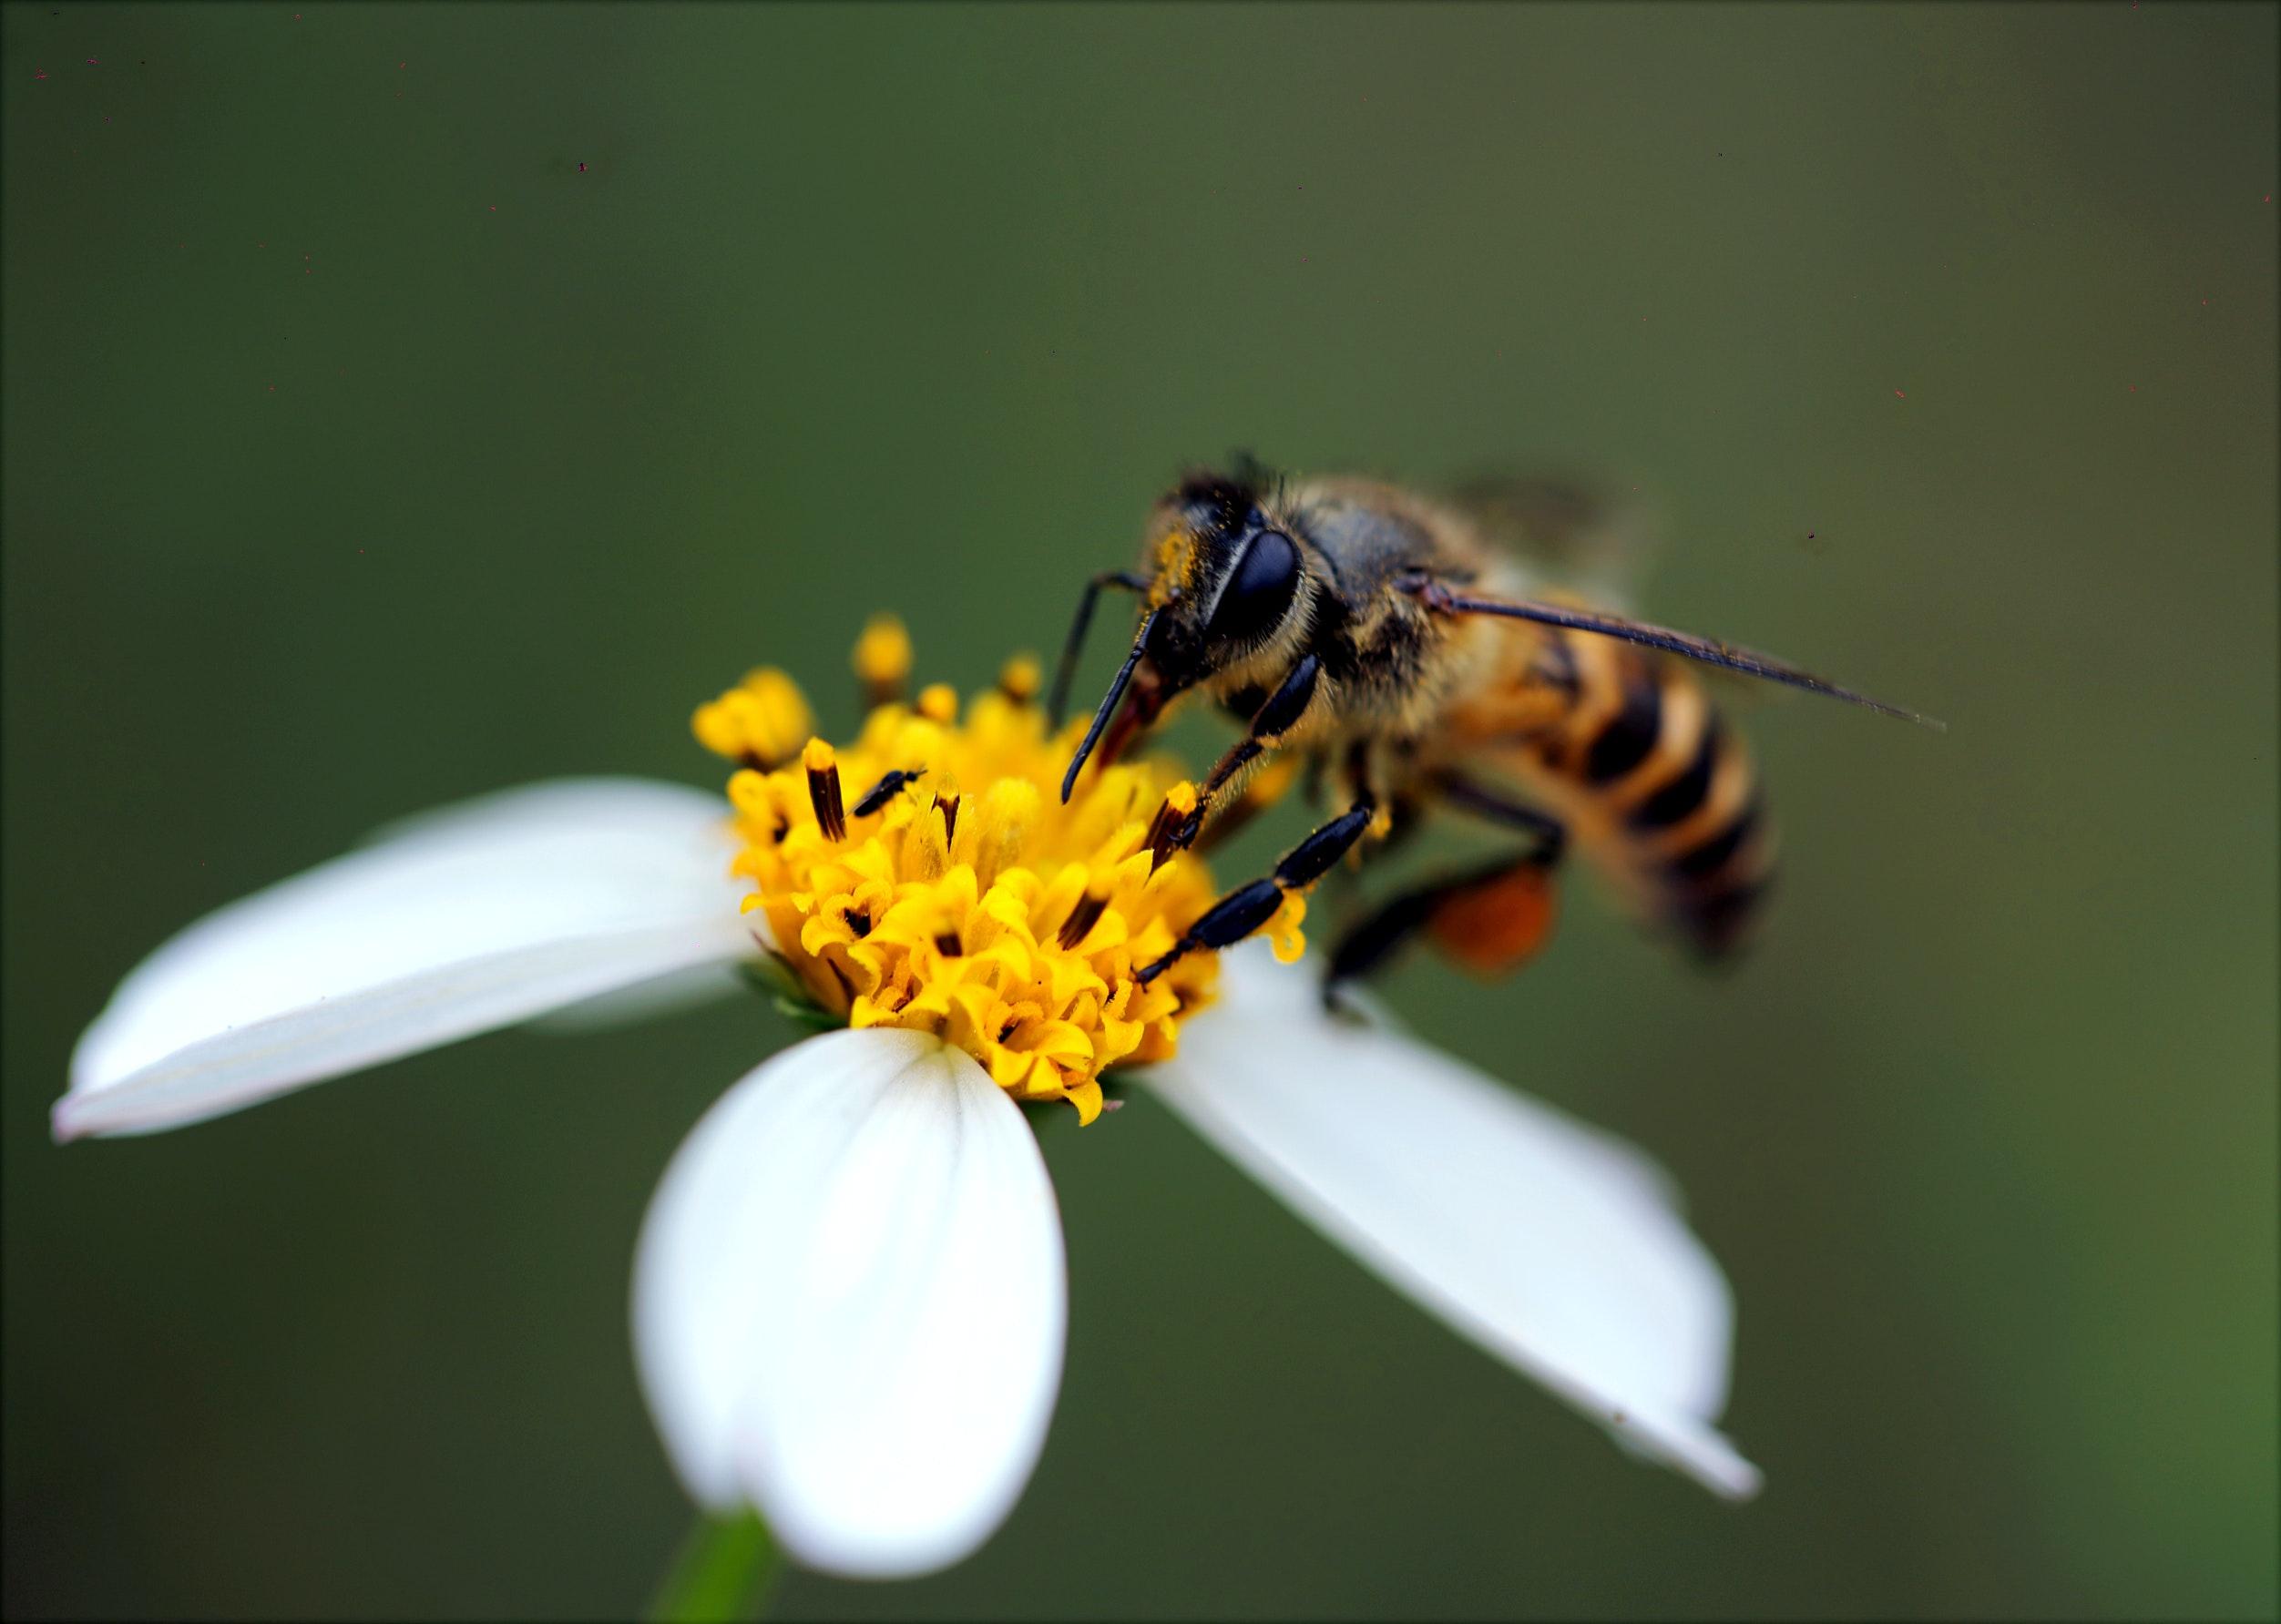 guêpe qui pollinise